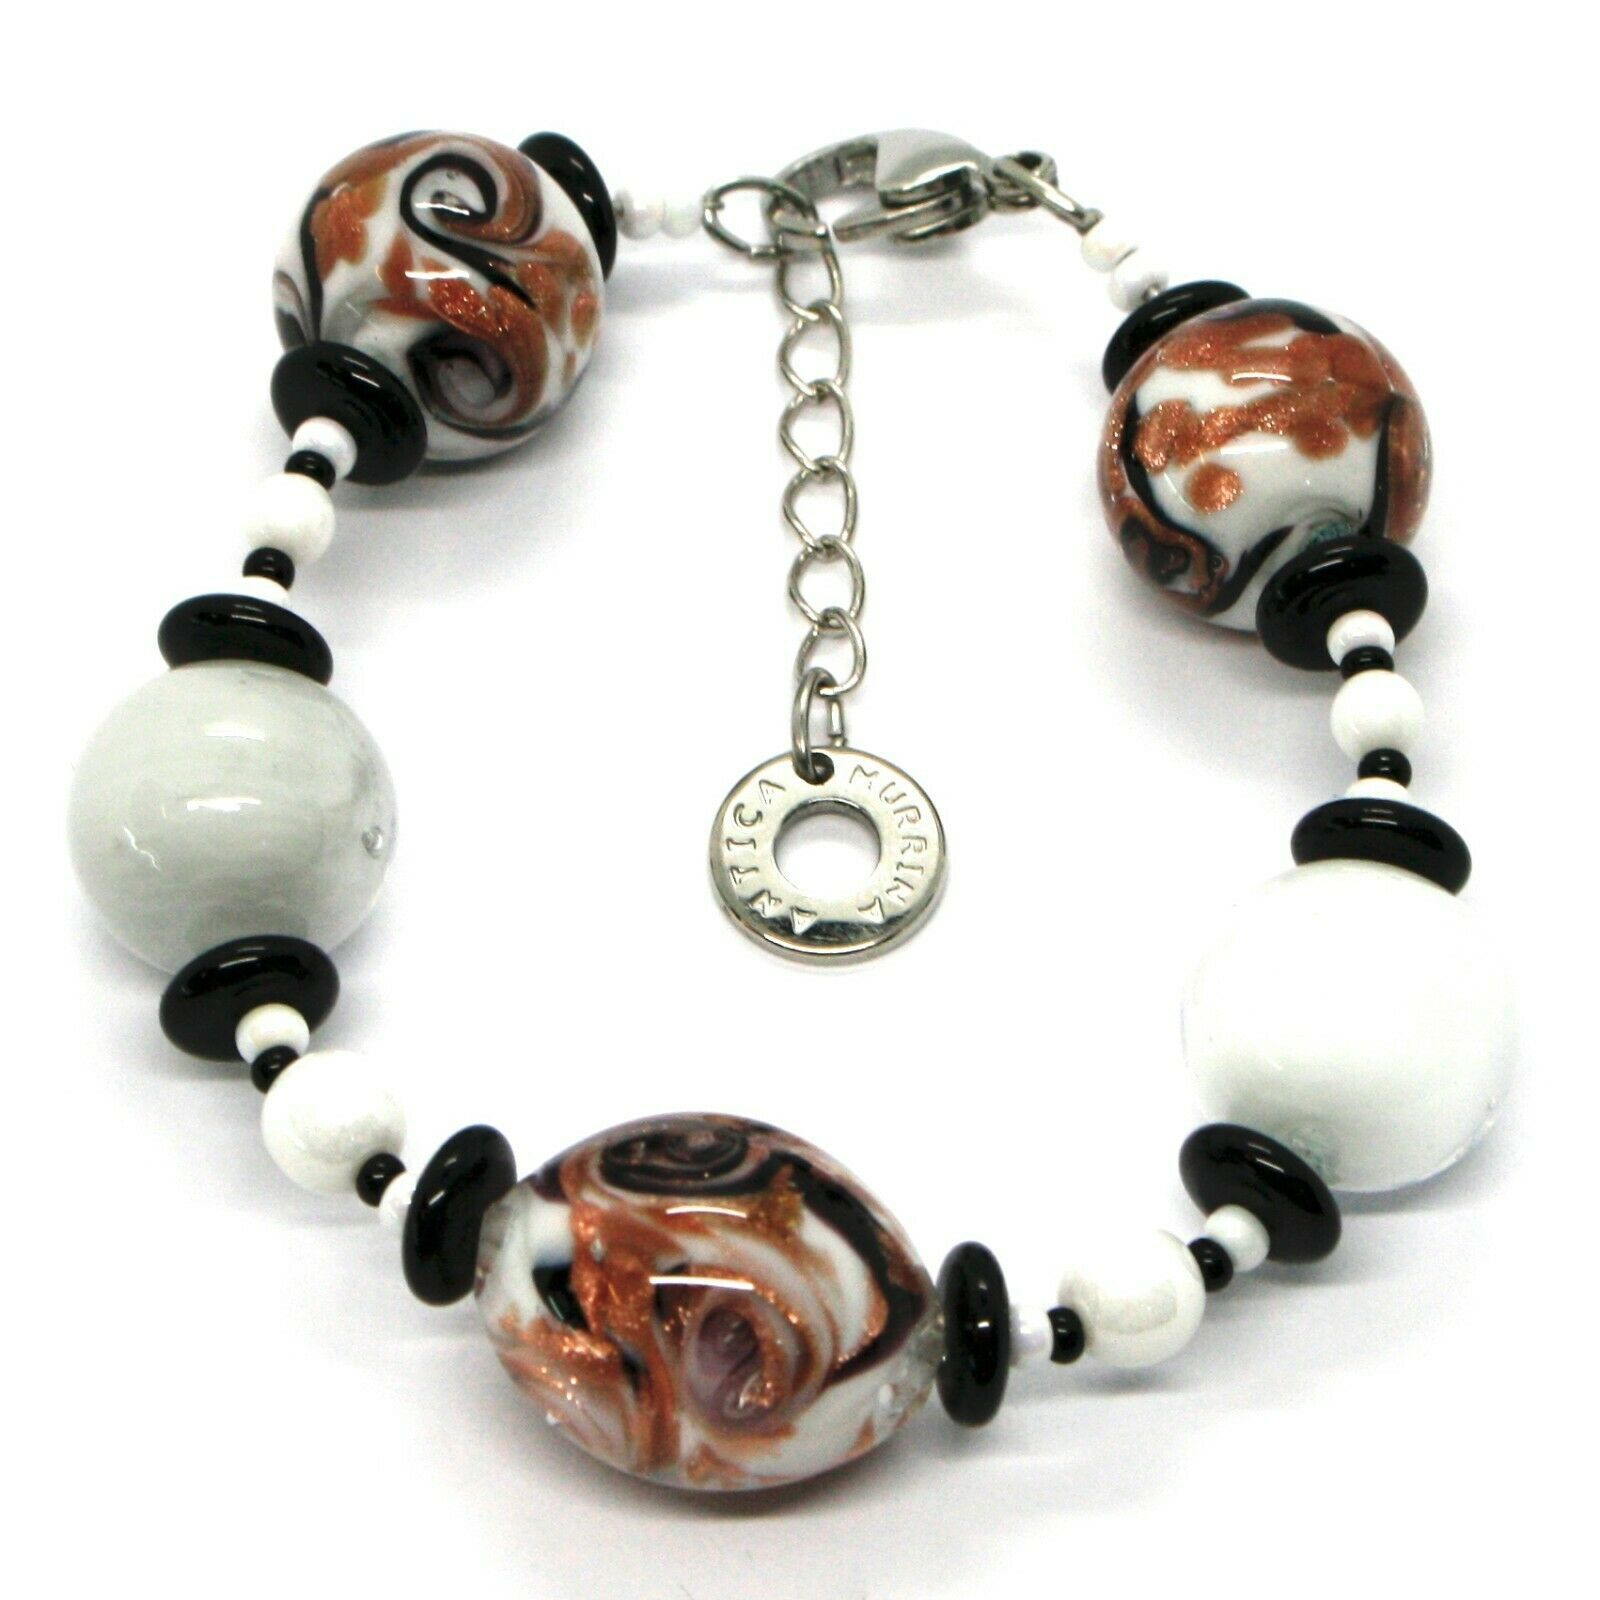 Bracelet Antica Murrina Venezia BR801A15, Tese, Murano Glass, Spheres White